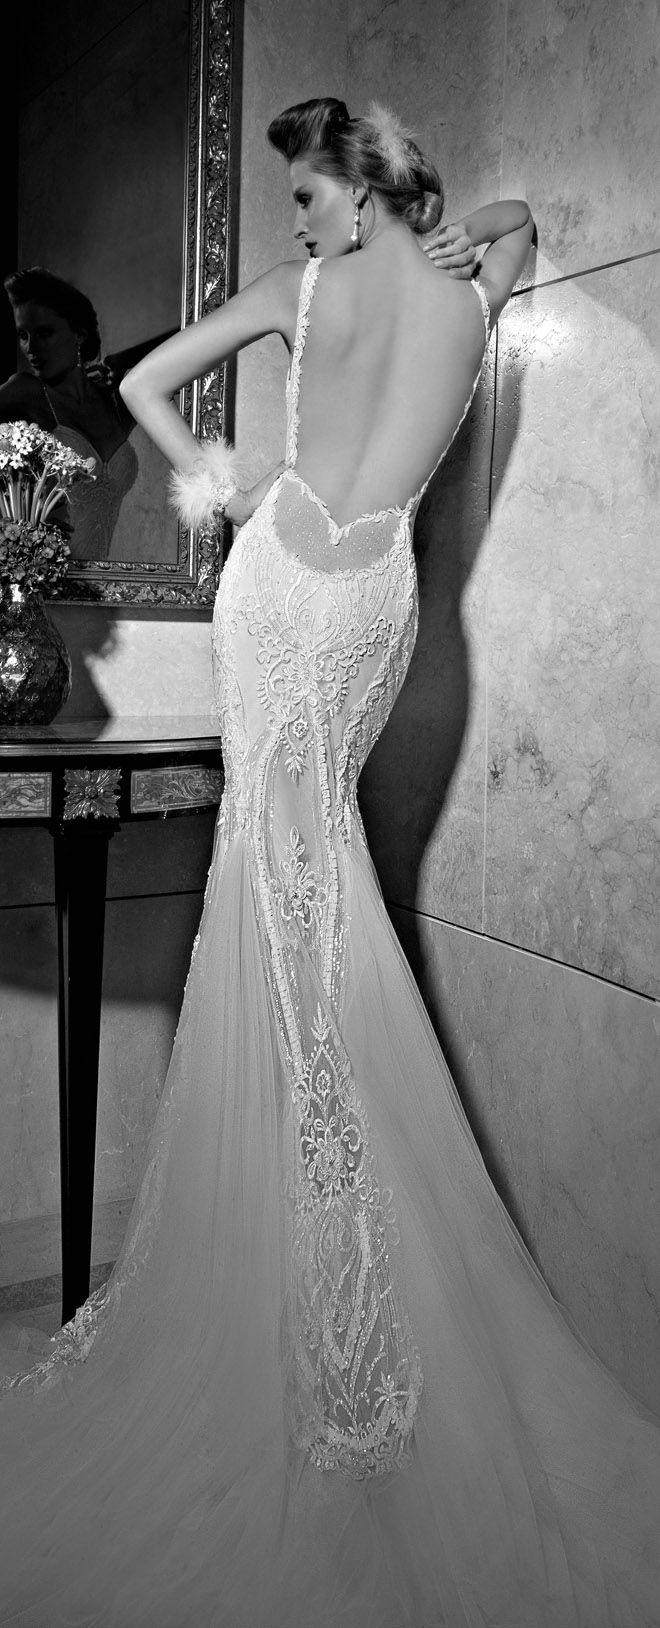 best wedding dreams images on pinterest wedding wedding